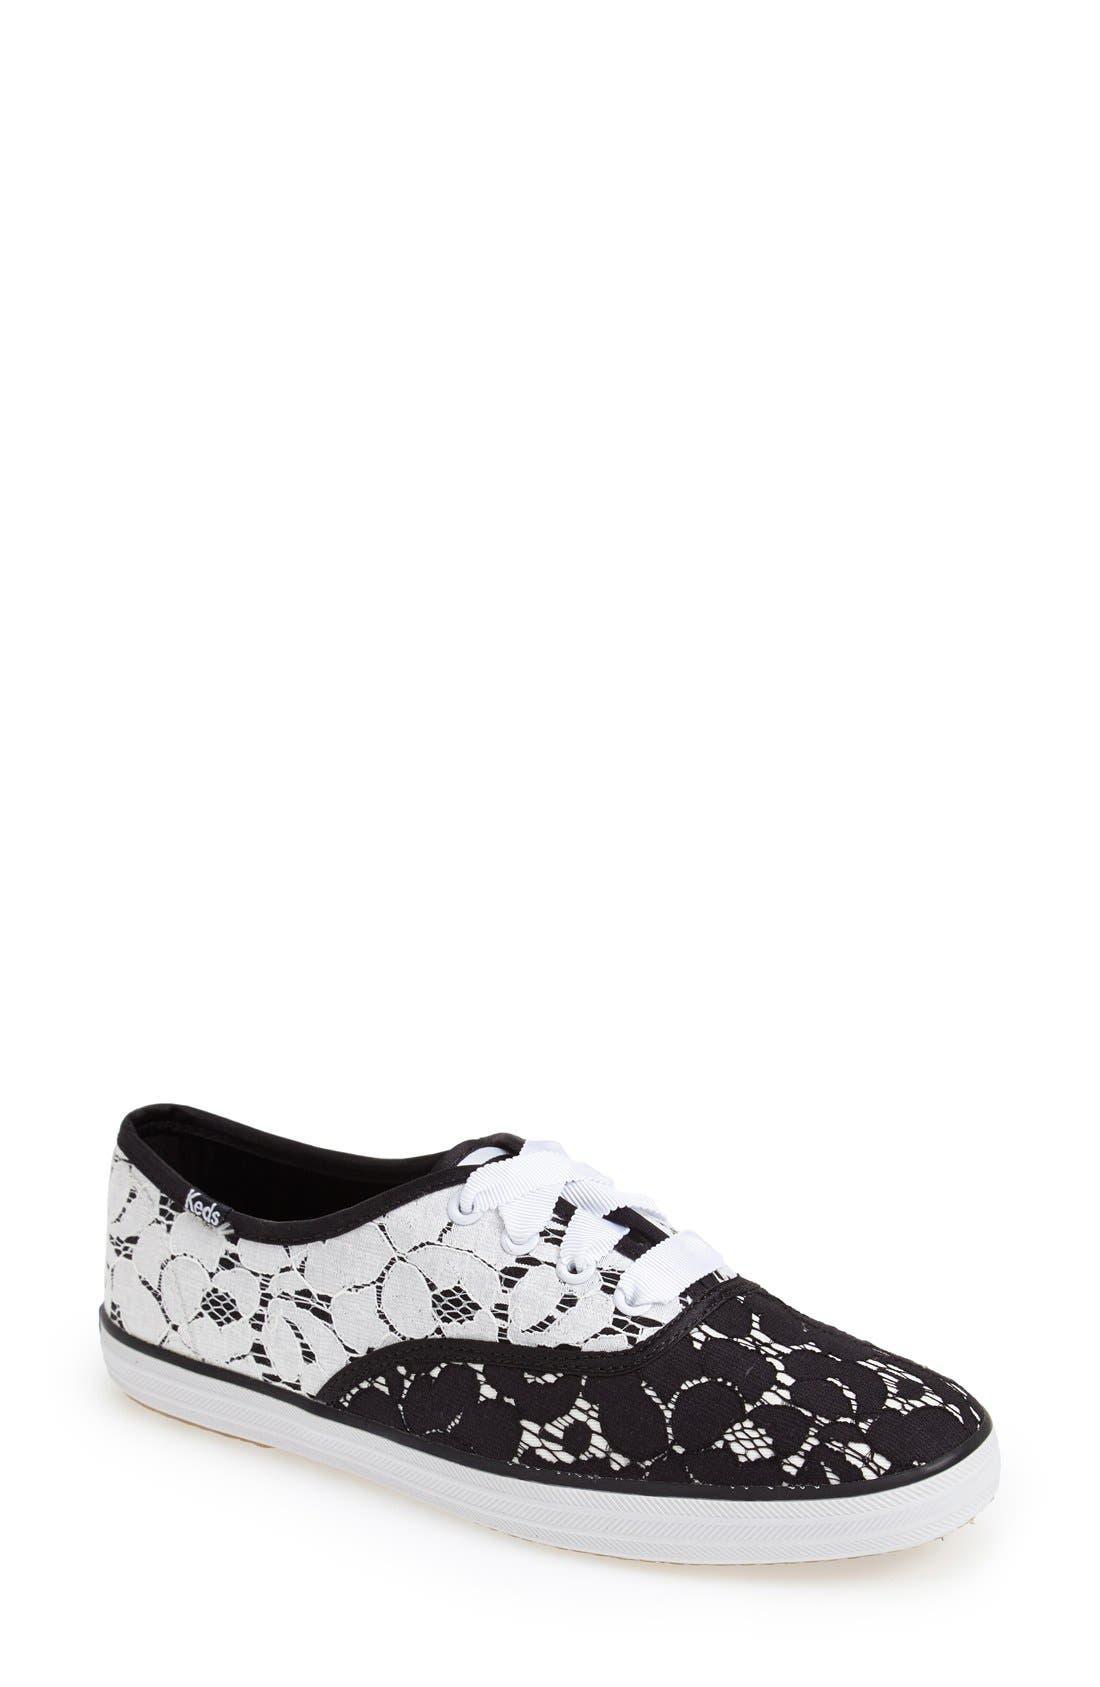 Main Image - Keds® 'Champion - Lace' Sneaker (Women)